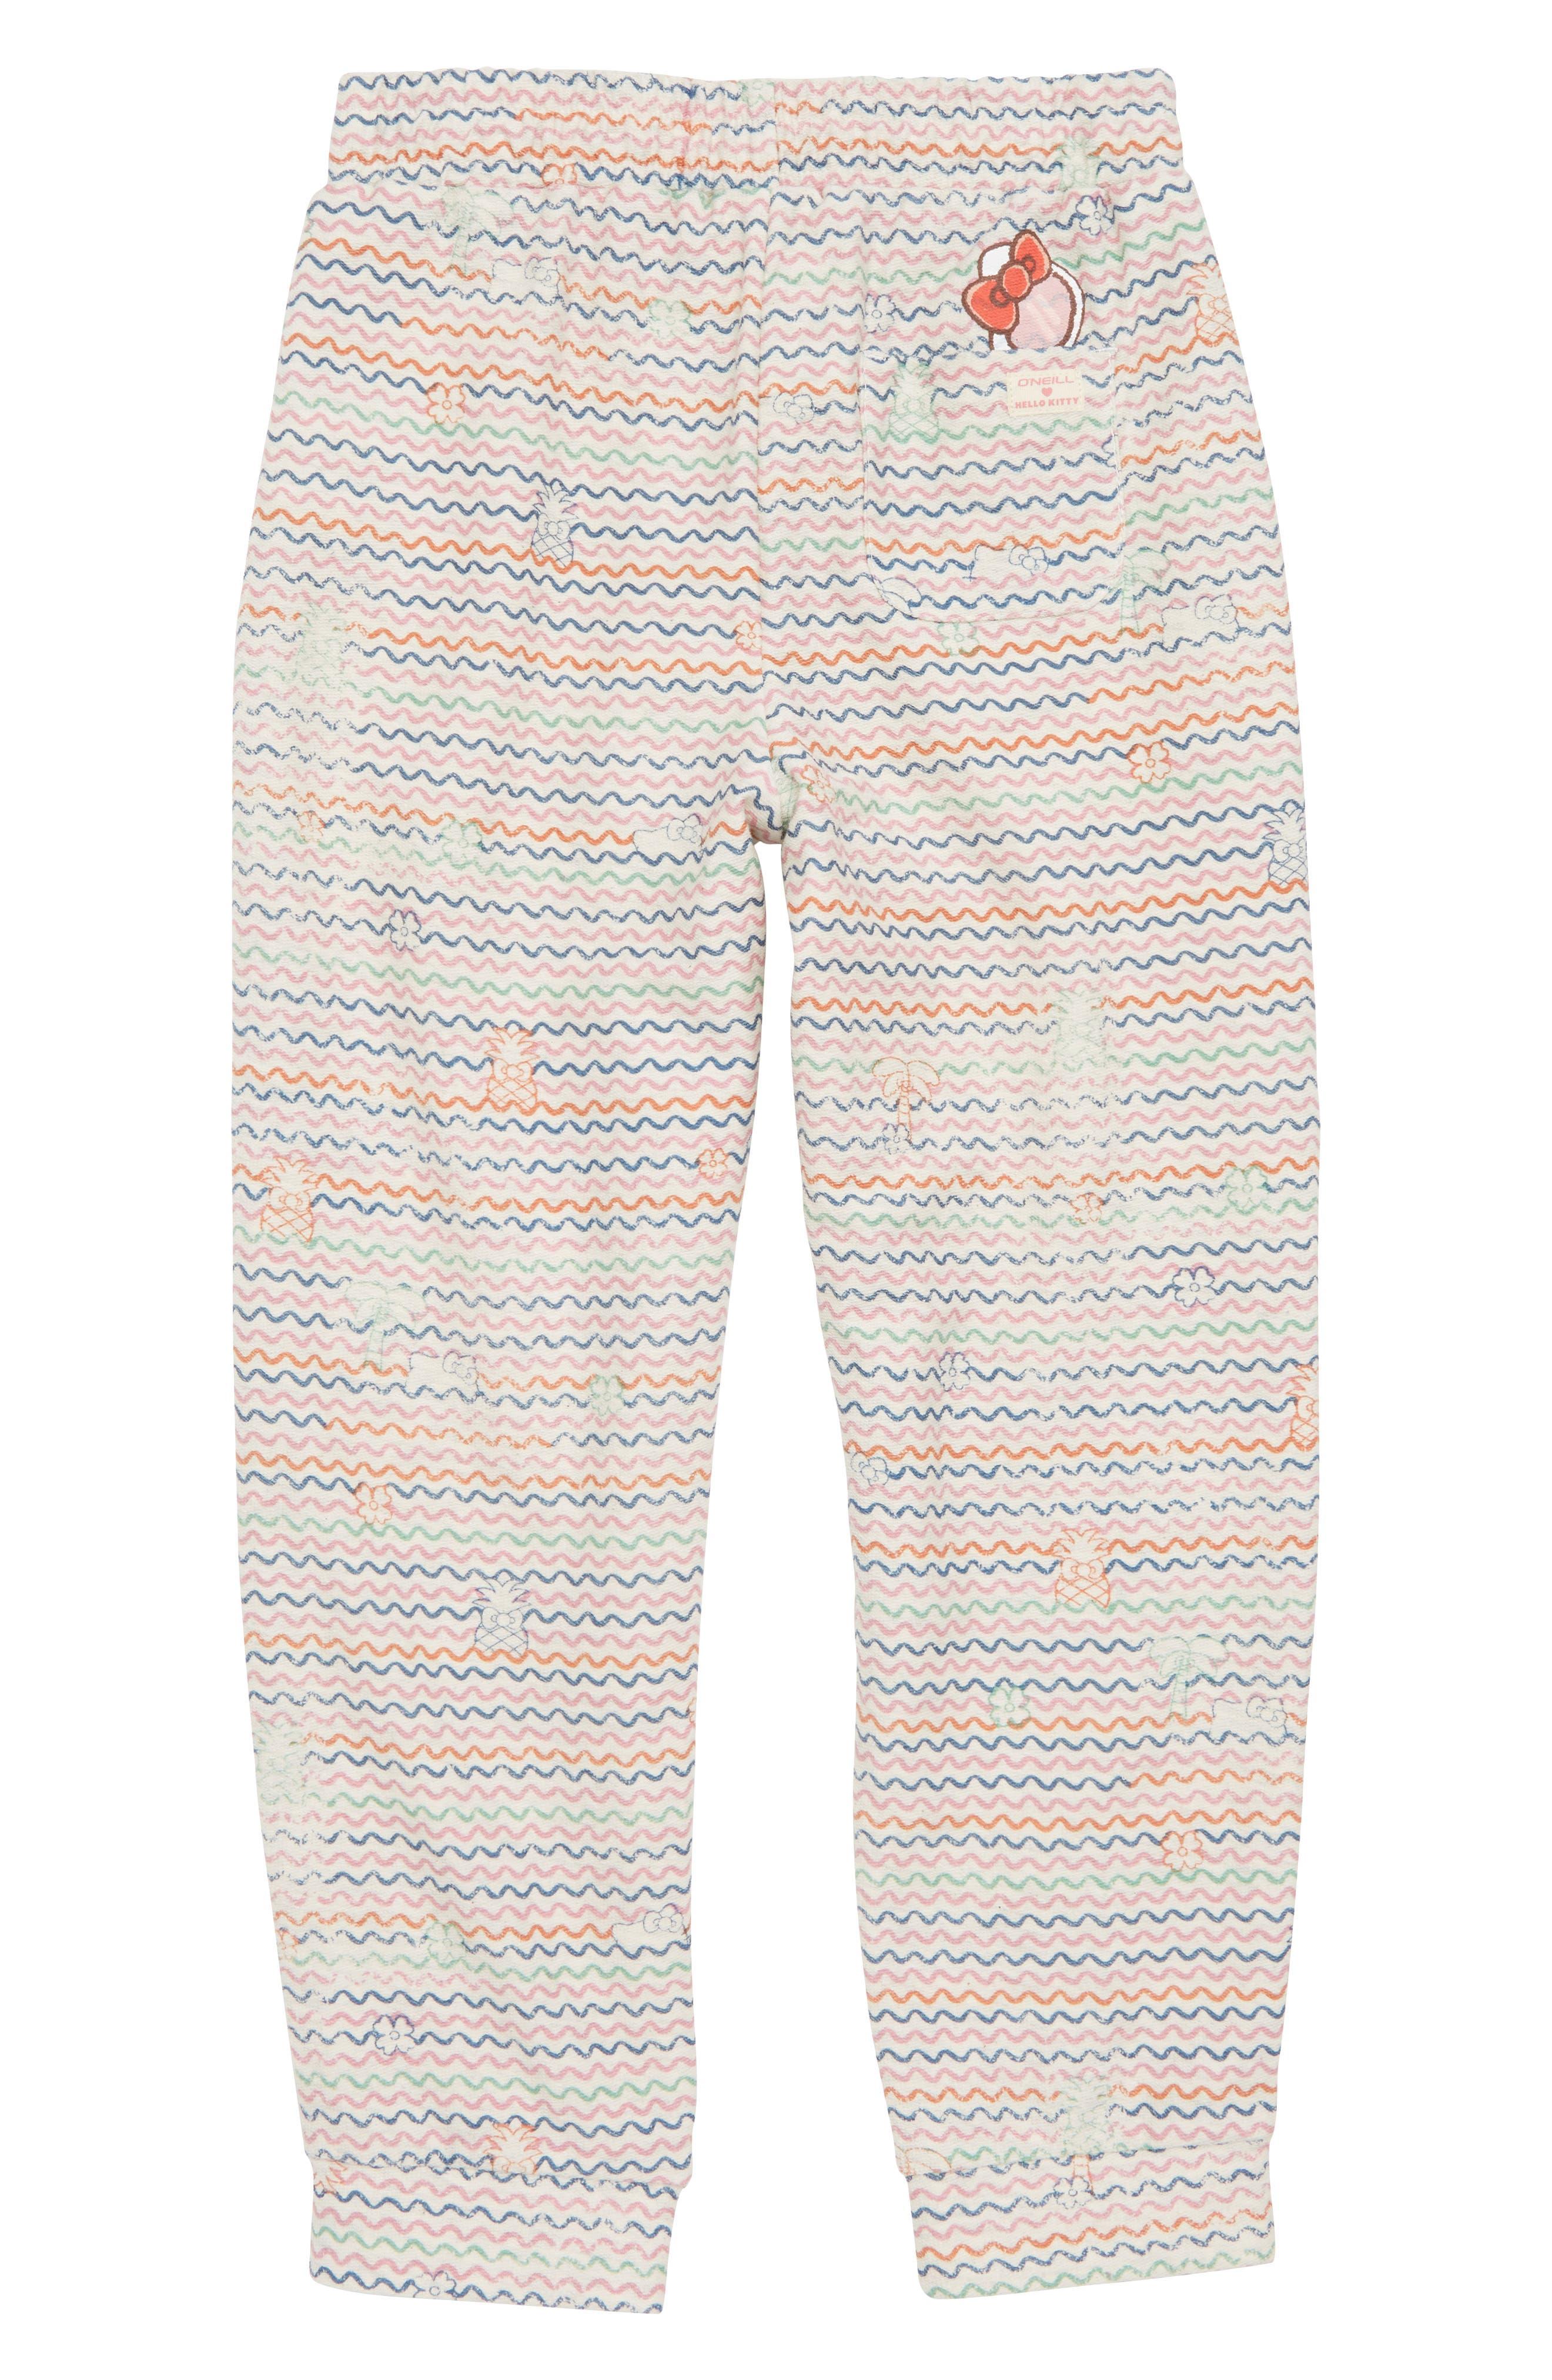 x Hello Kitty<sup>®</sup> Tropical Treasures Fleece Pants,                             Alternate thumbnail 4, color,                             250